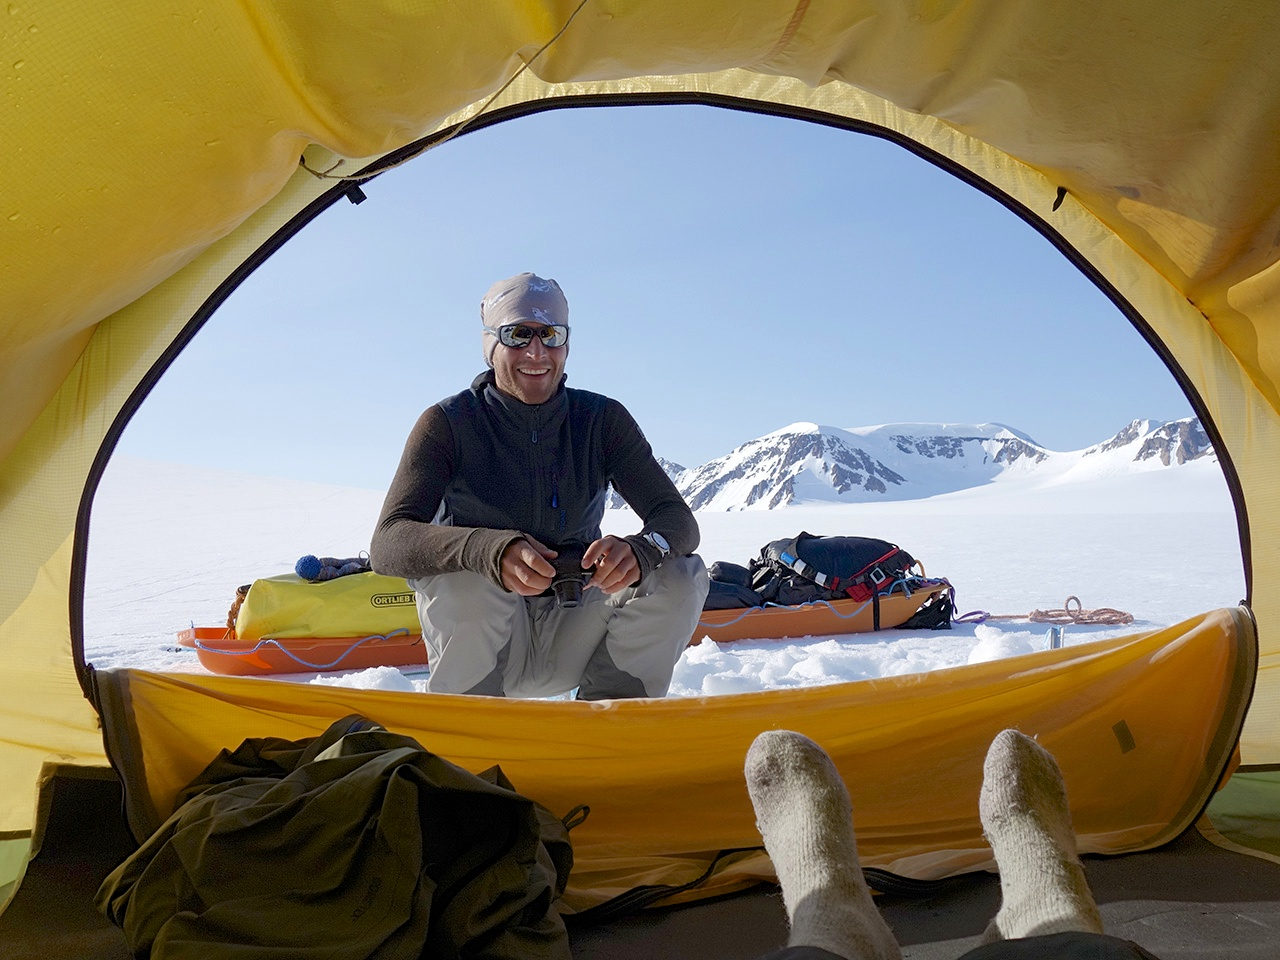 Svalbard_BørgeOusland2014-08-0910-24-54_10